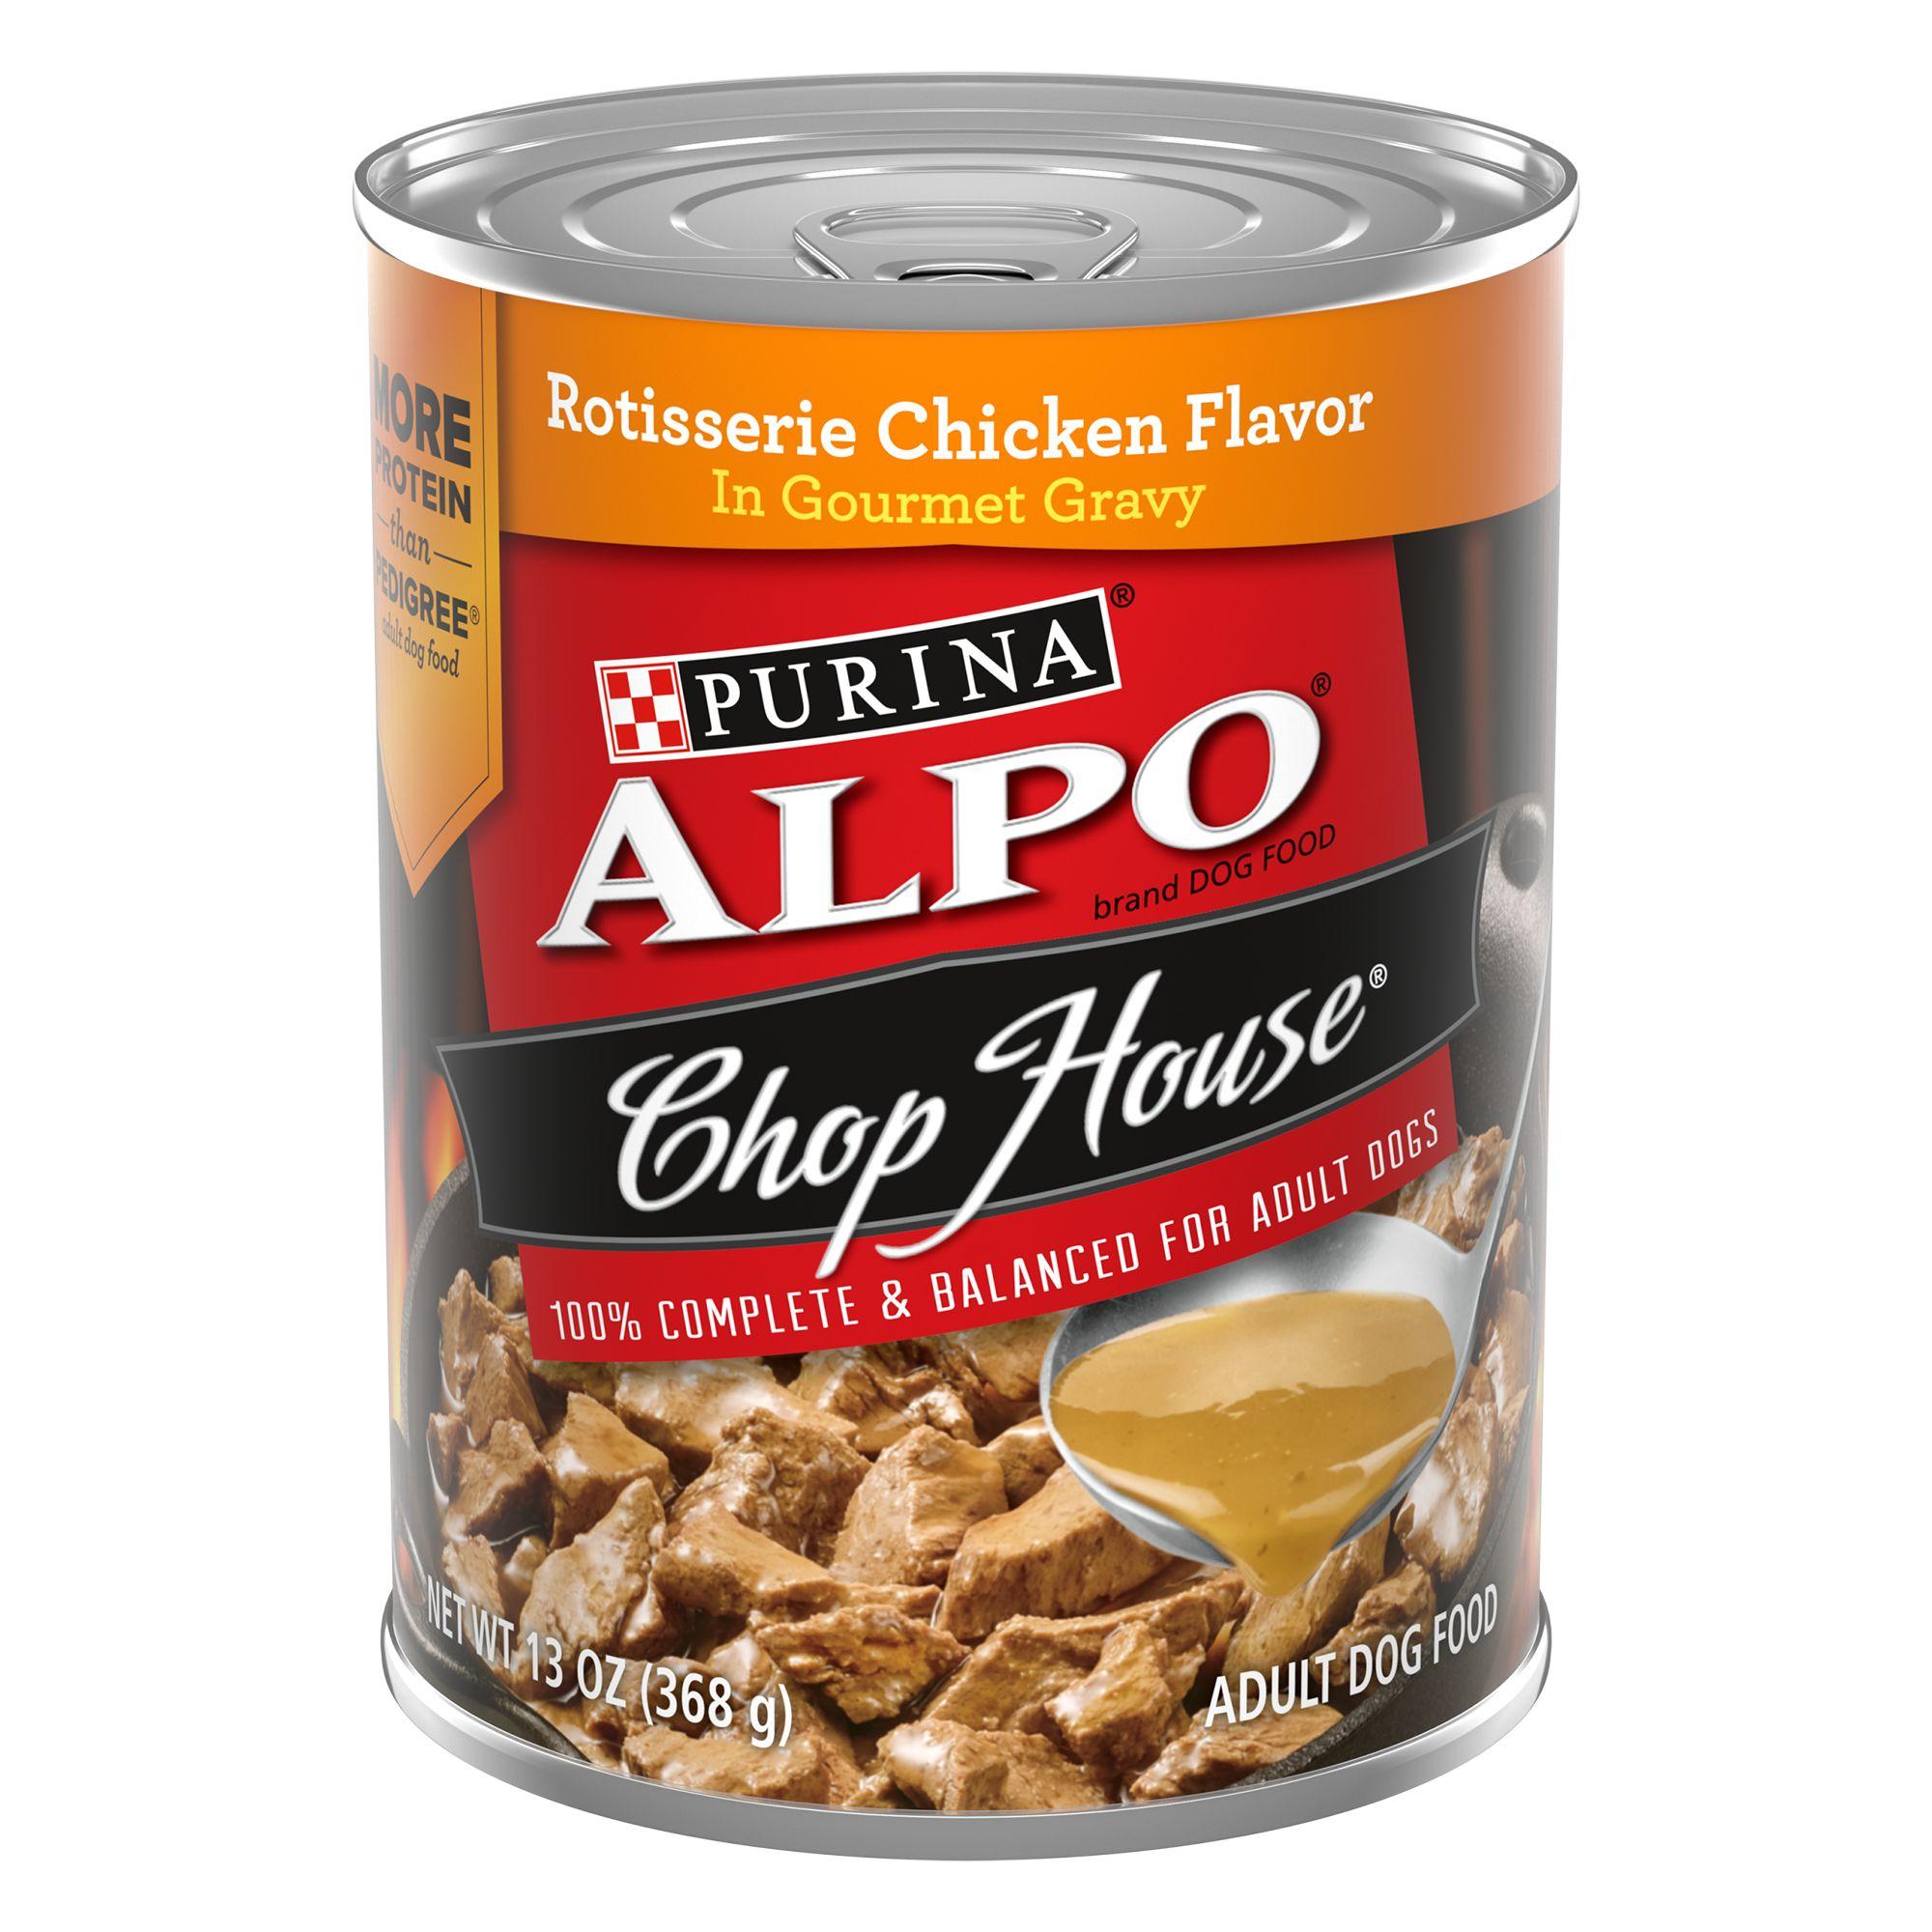 Purina® Alpo® Chophouse Originals Adult Dog Food 5142067